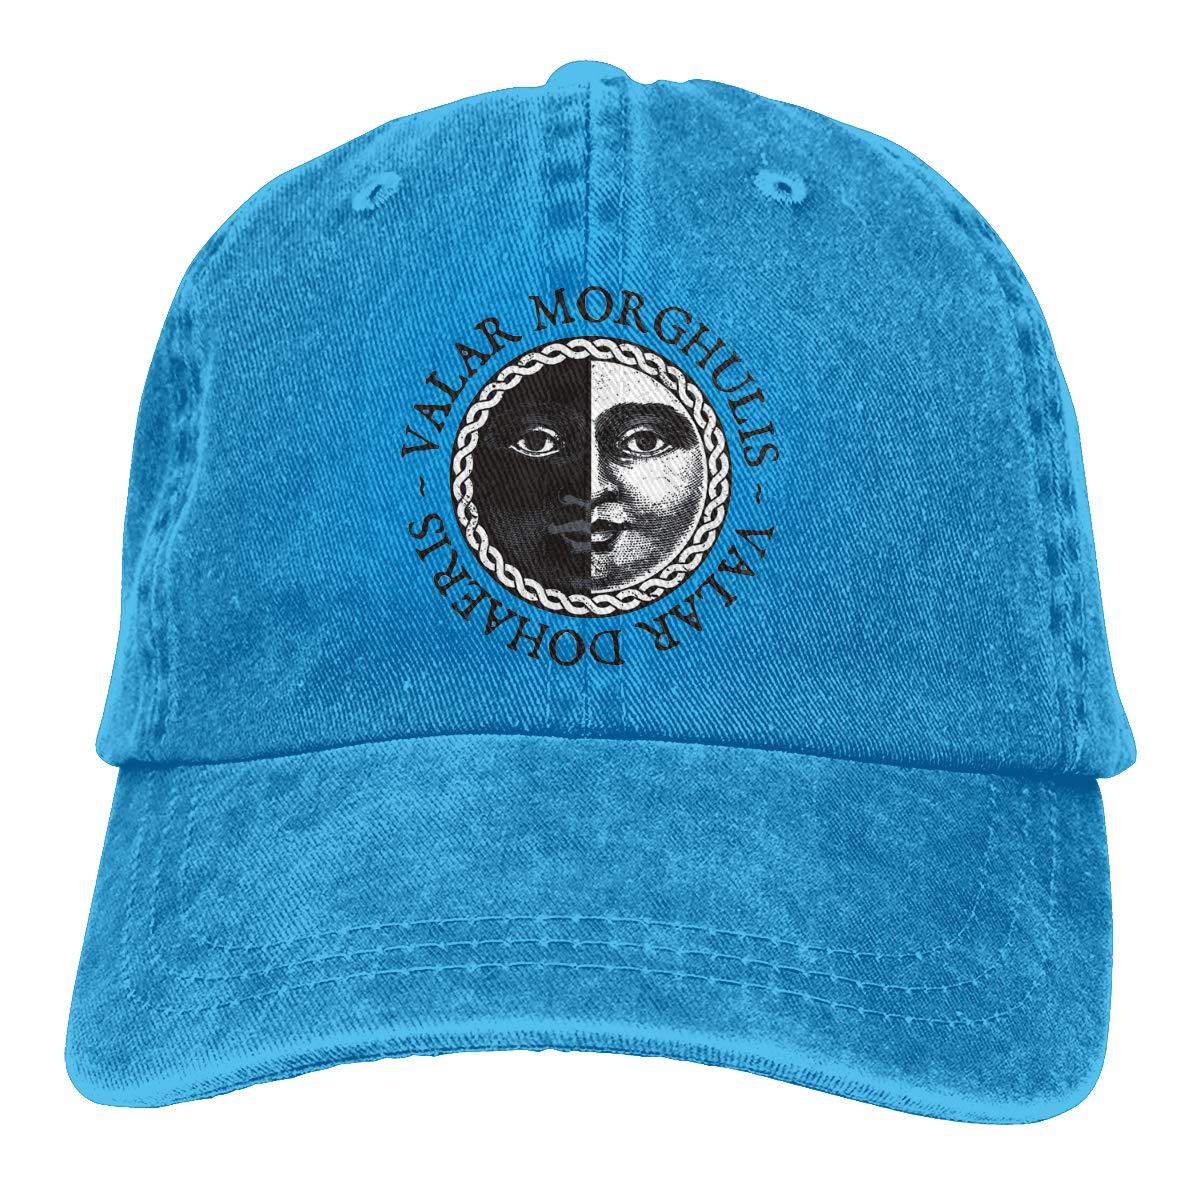 Optumus Cowboy Baseball Cap Valar-Morghulis Boven Trucker Hat for Men//Women